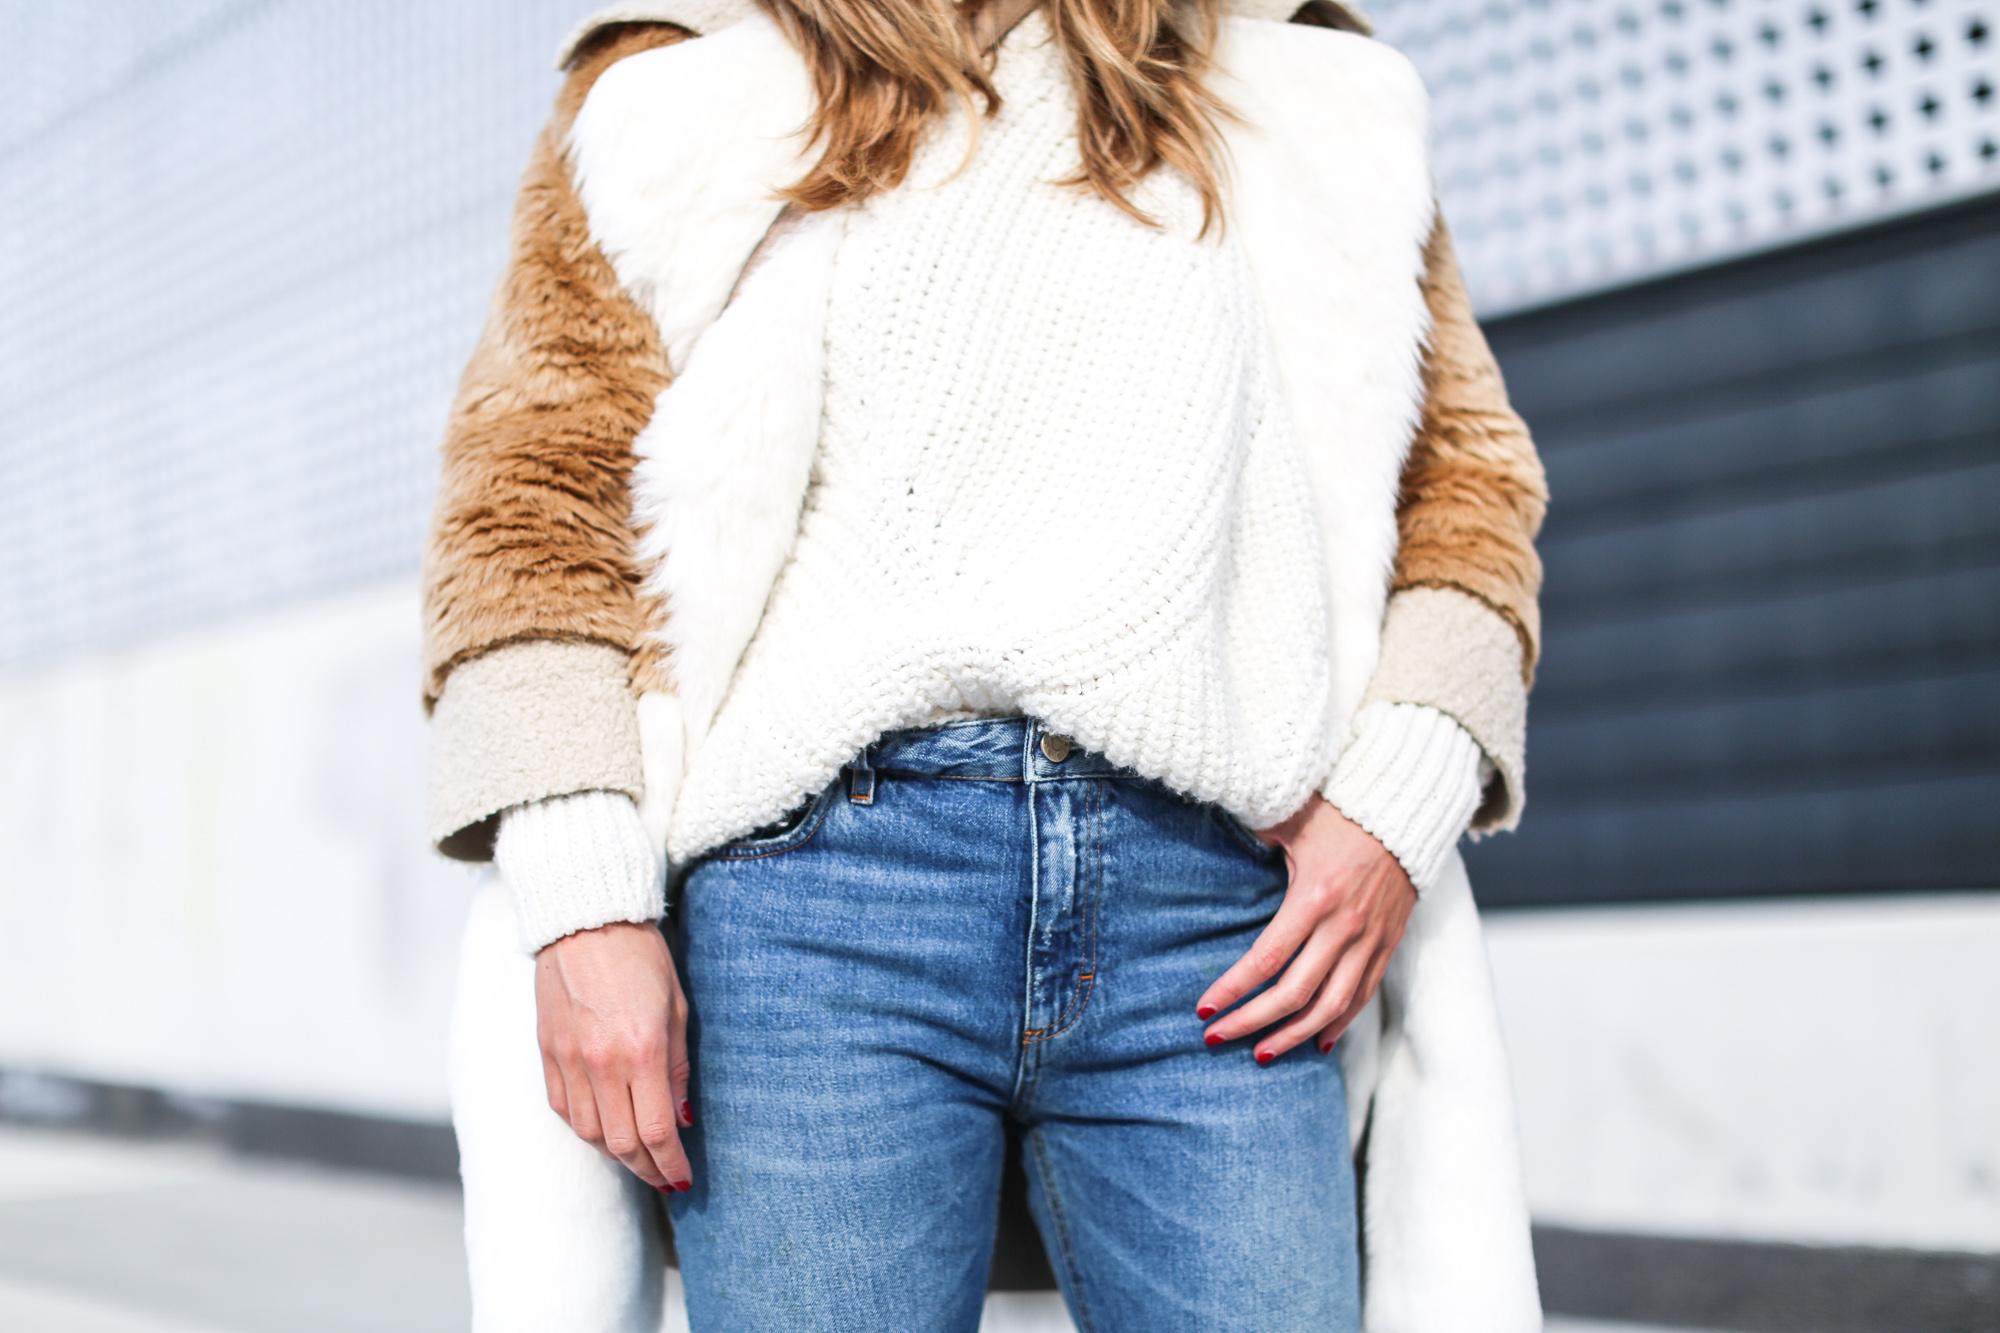 Clochet_streetstyle_fashionblogger_asosfauxfurteddycoat_pinkadidashamburg_leztinstreet_acnestudiosjeans_pop-7